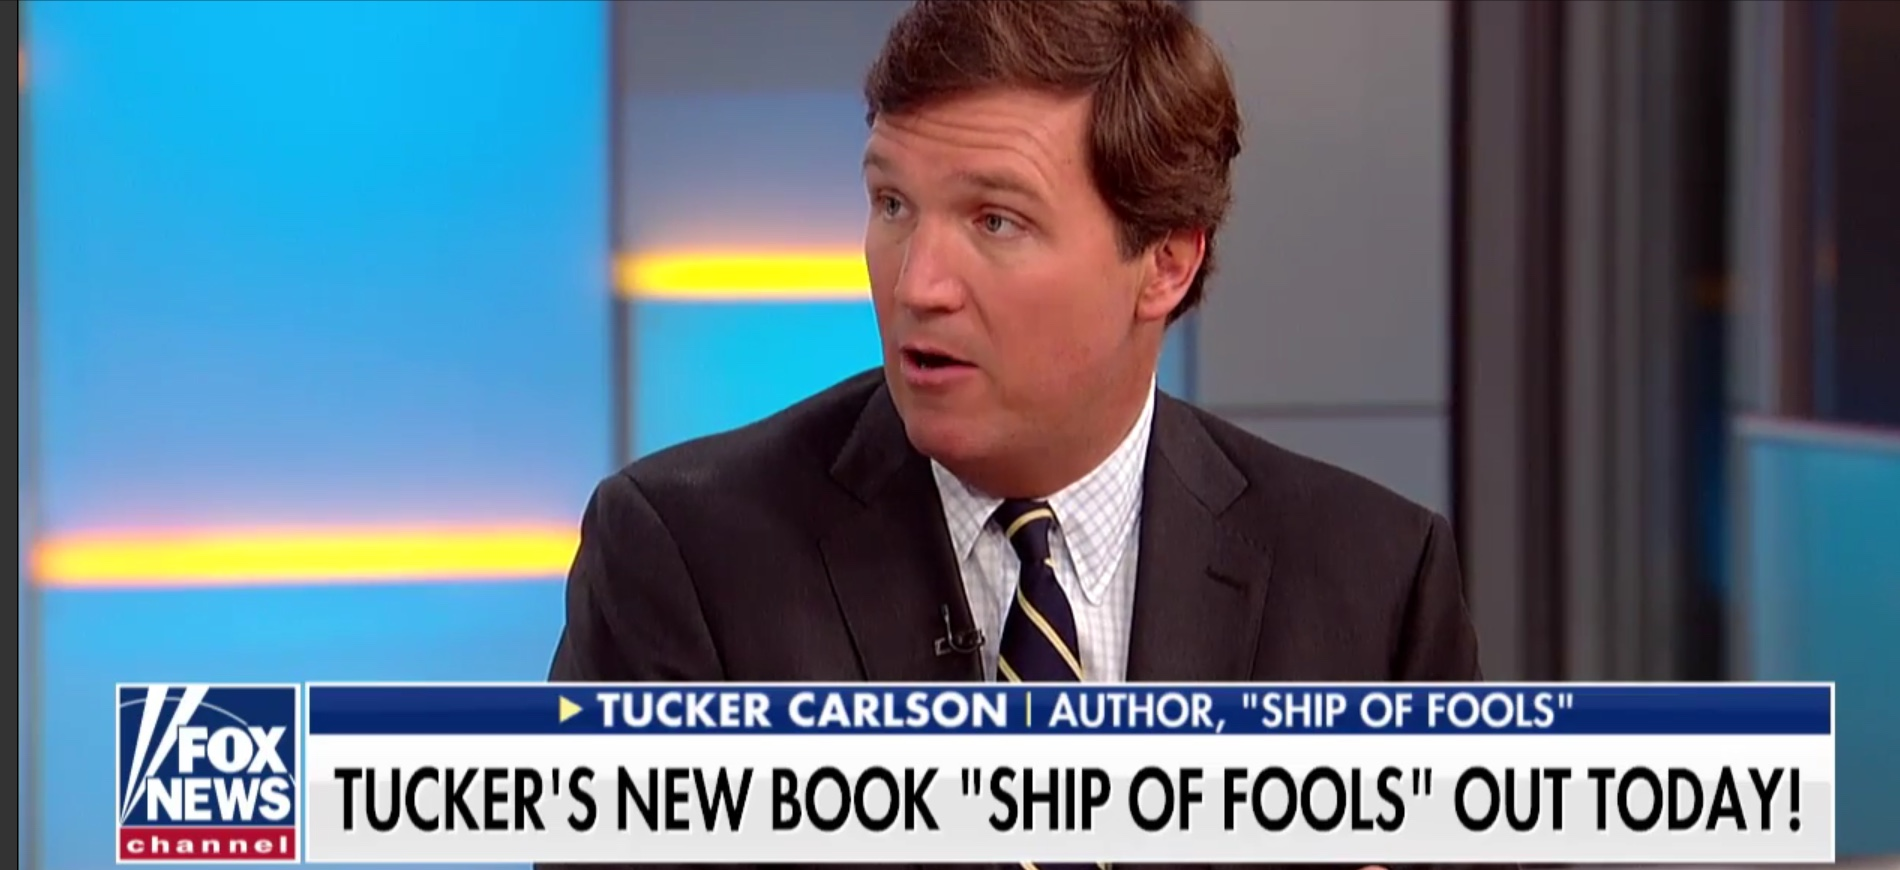 "Tucker Carlson discusses his new book ""Ship of Fools"" on Fox & Friends, Oct. 2, 2018. Fox News screenshot."